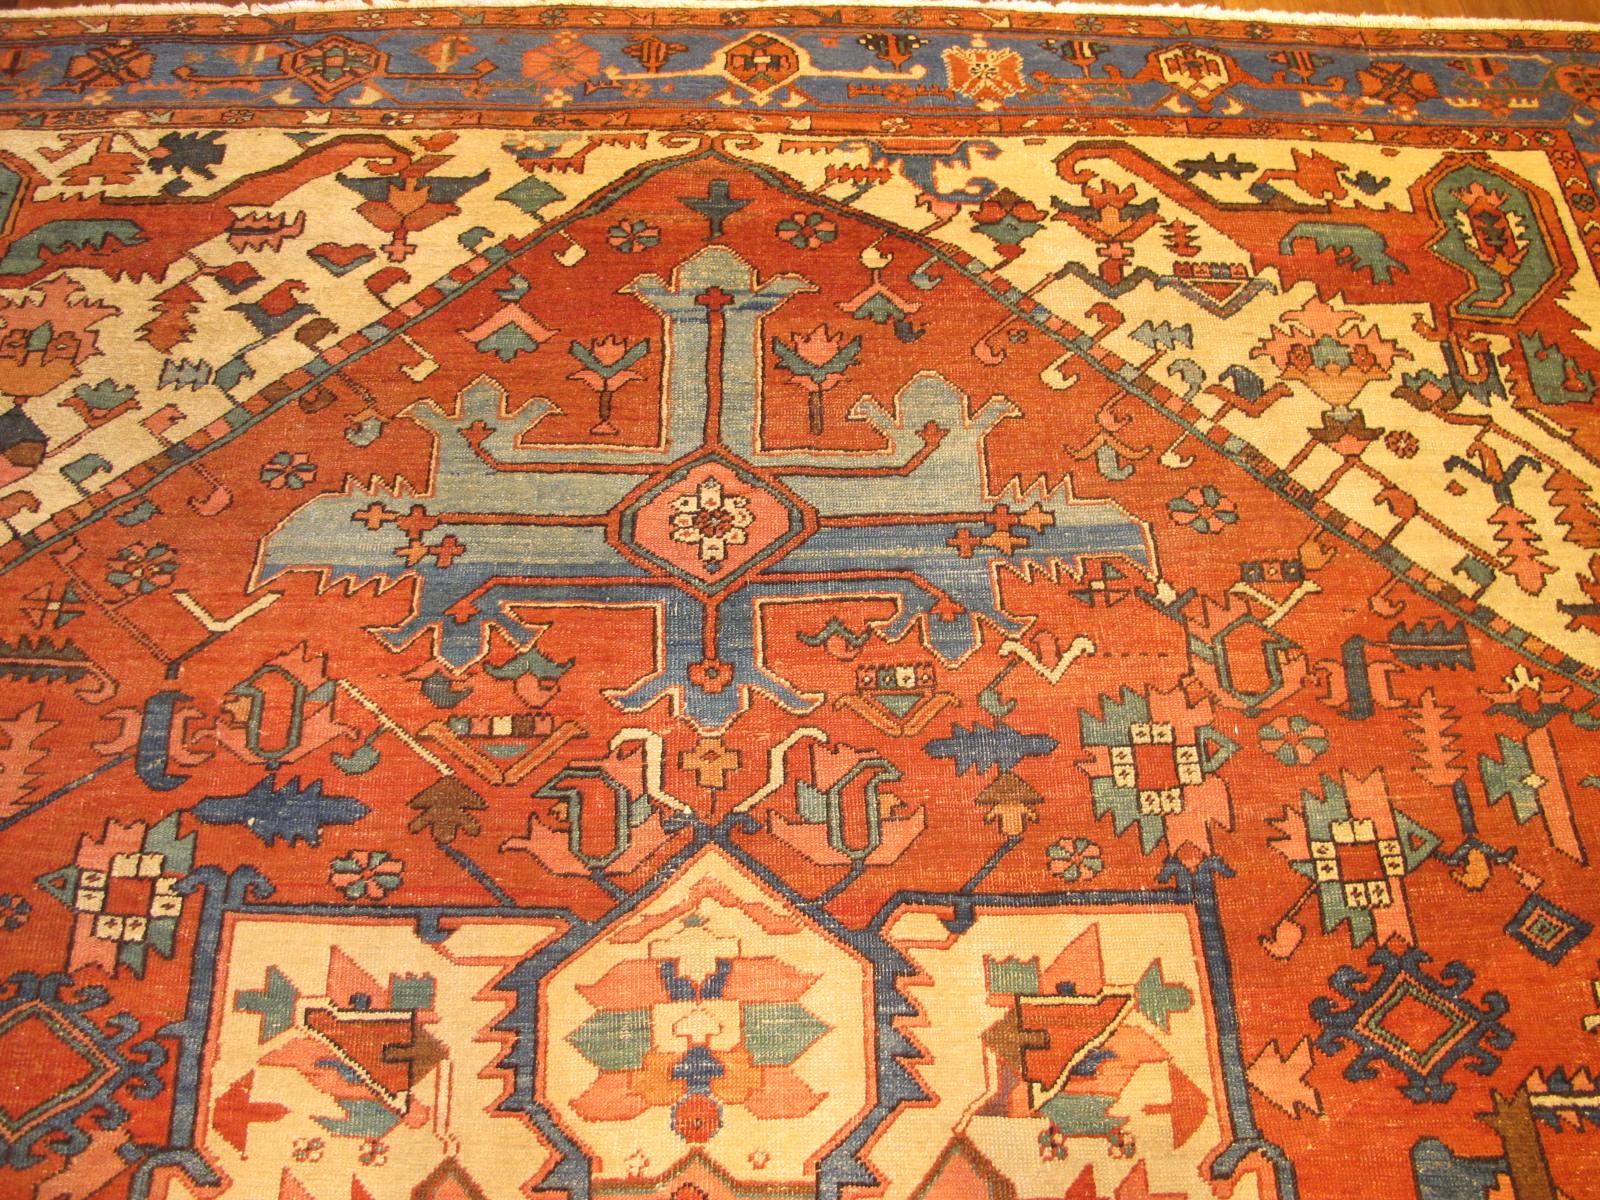 23196 antique persian serapi rug 9,10 x 12,3 (4)